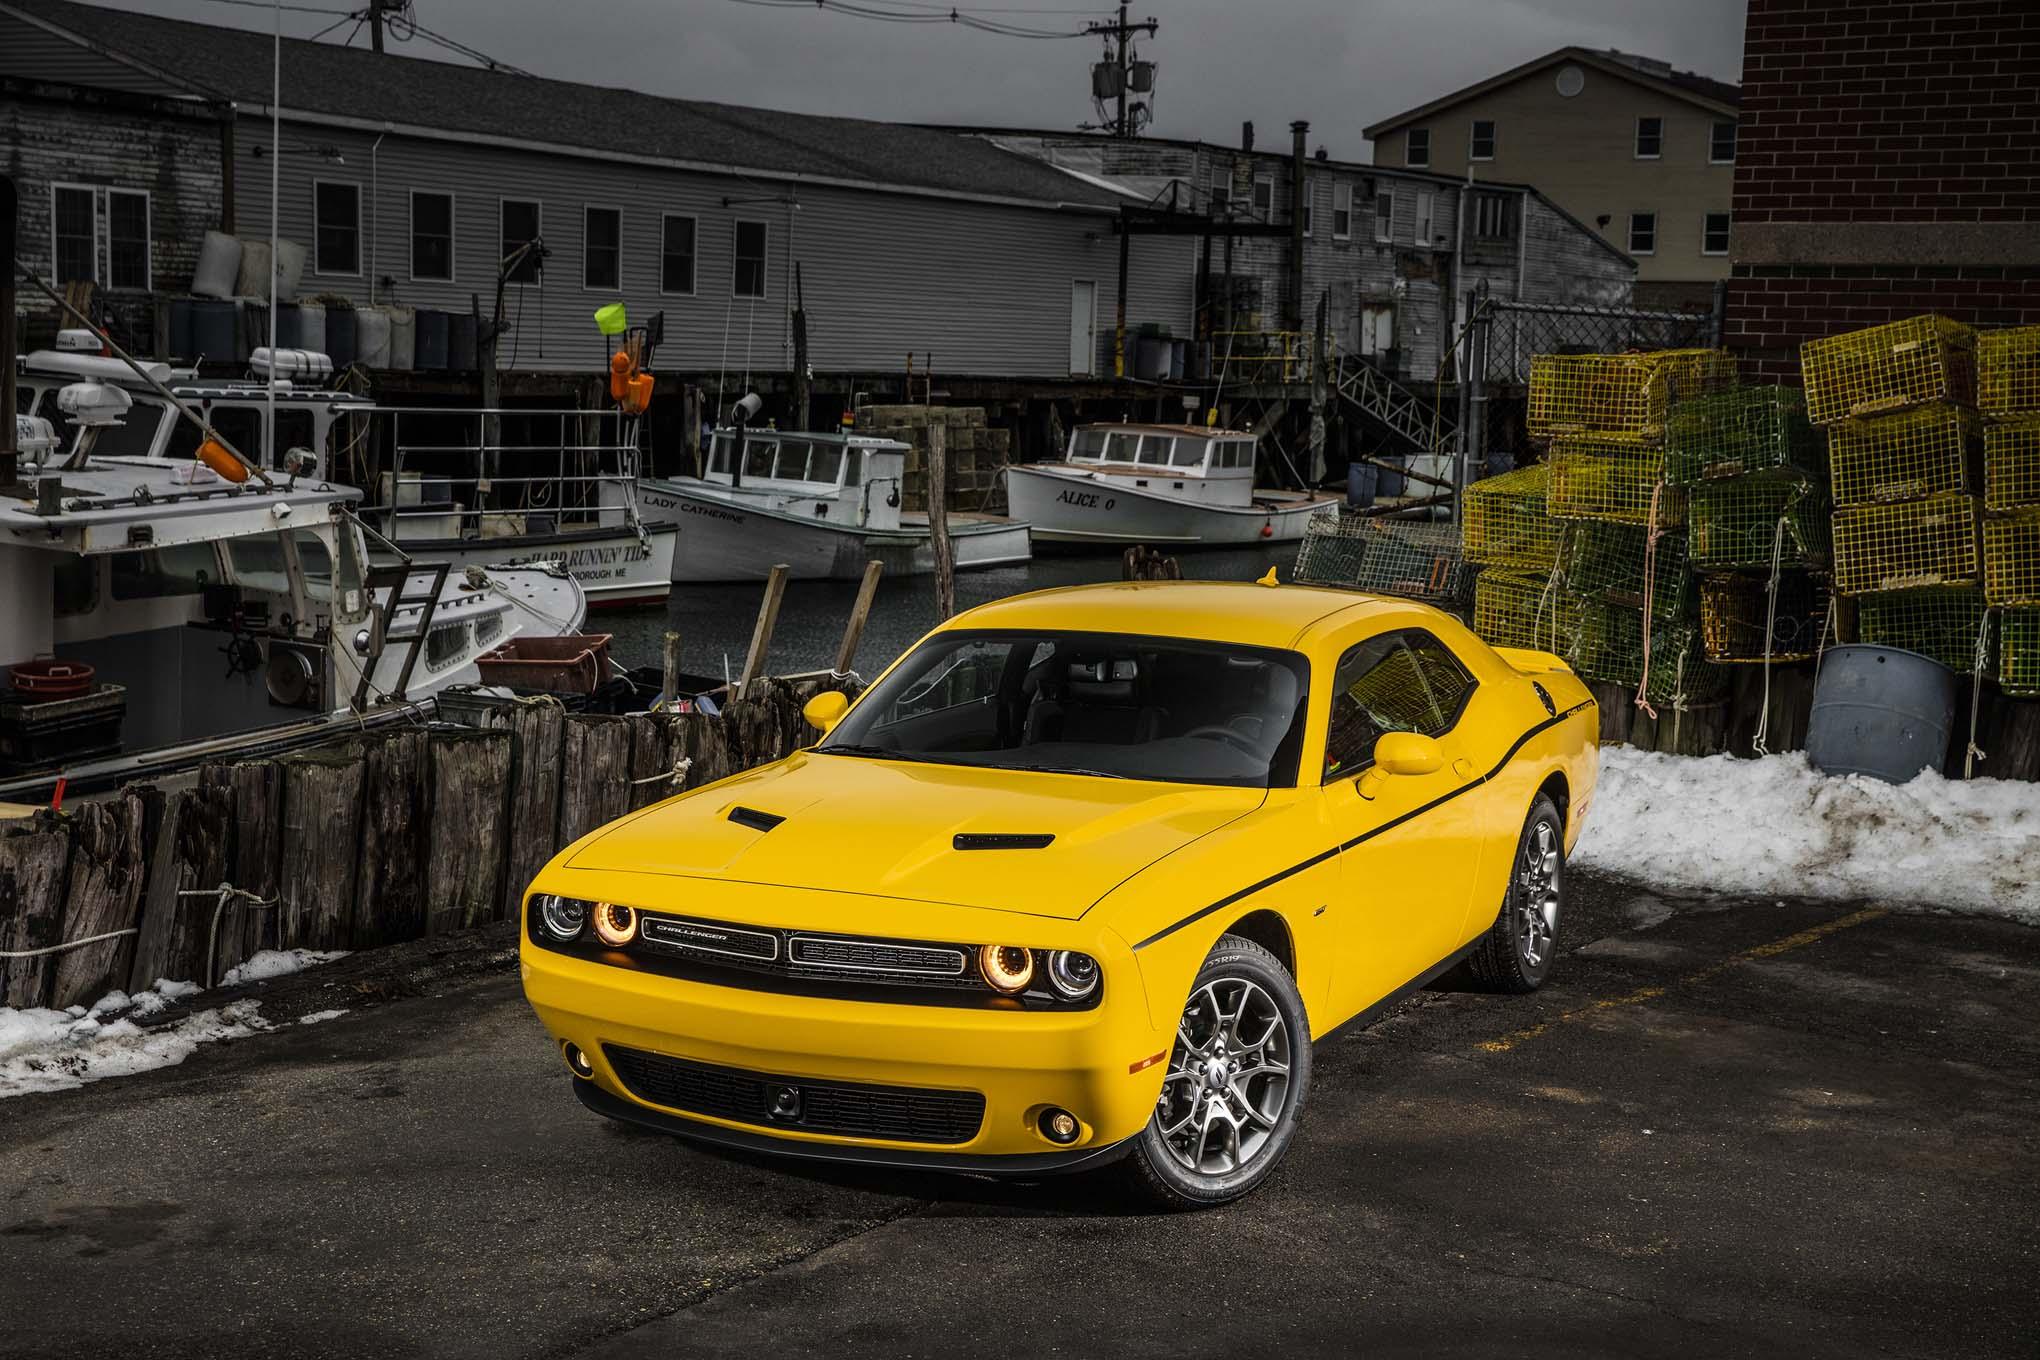 2017 Dodge Challenger GT front three quarter